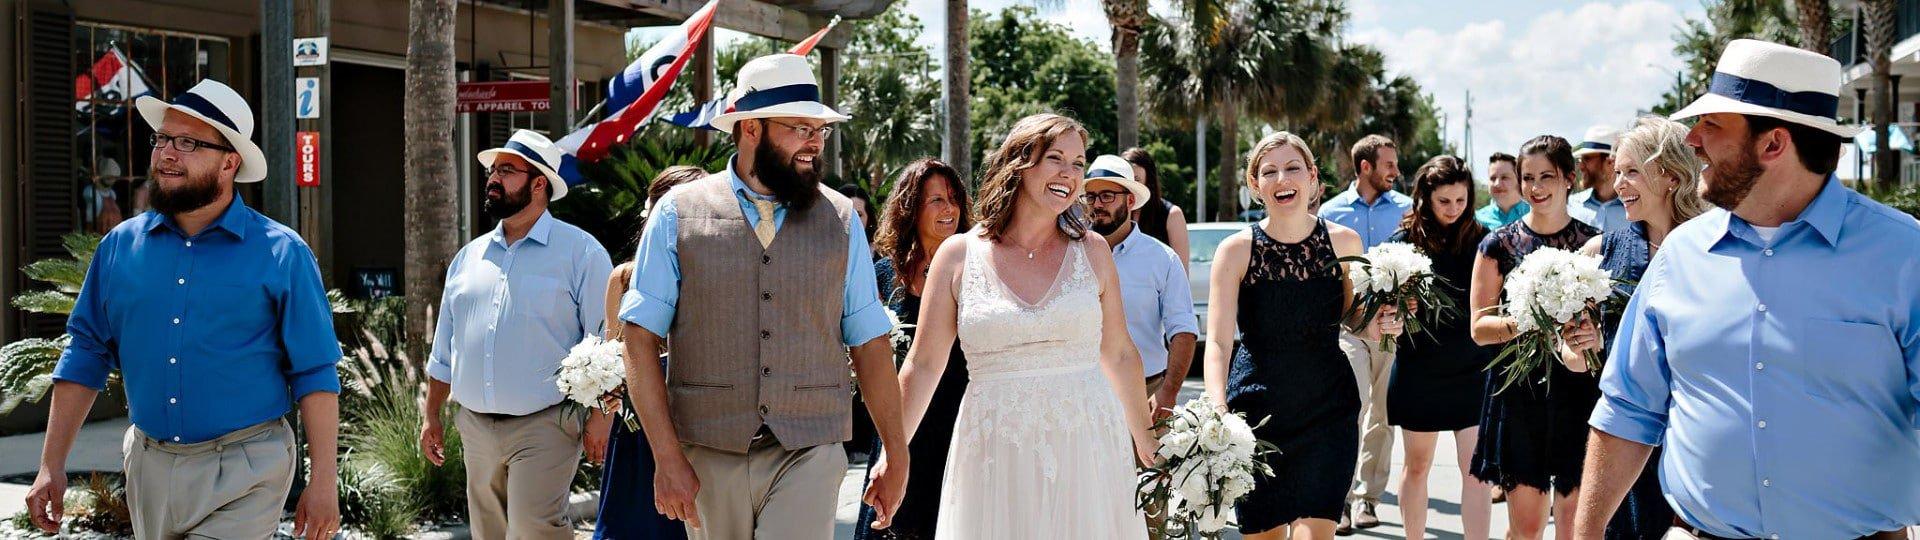 Wedding Services & Resources